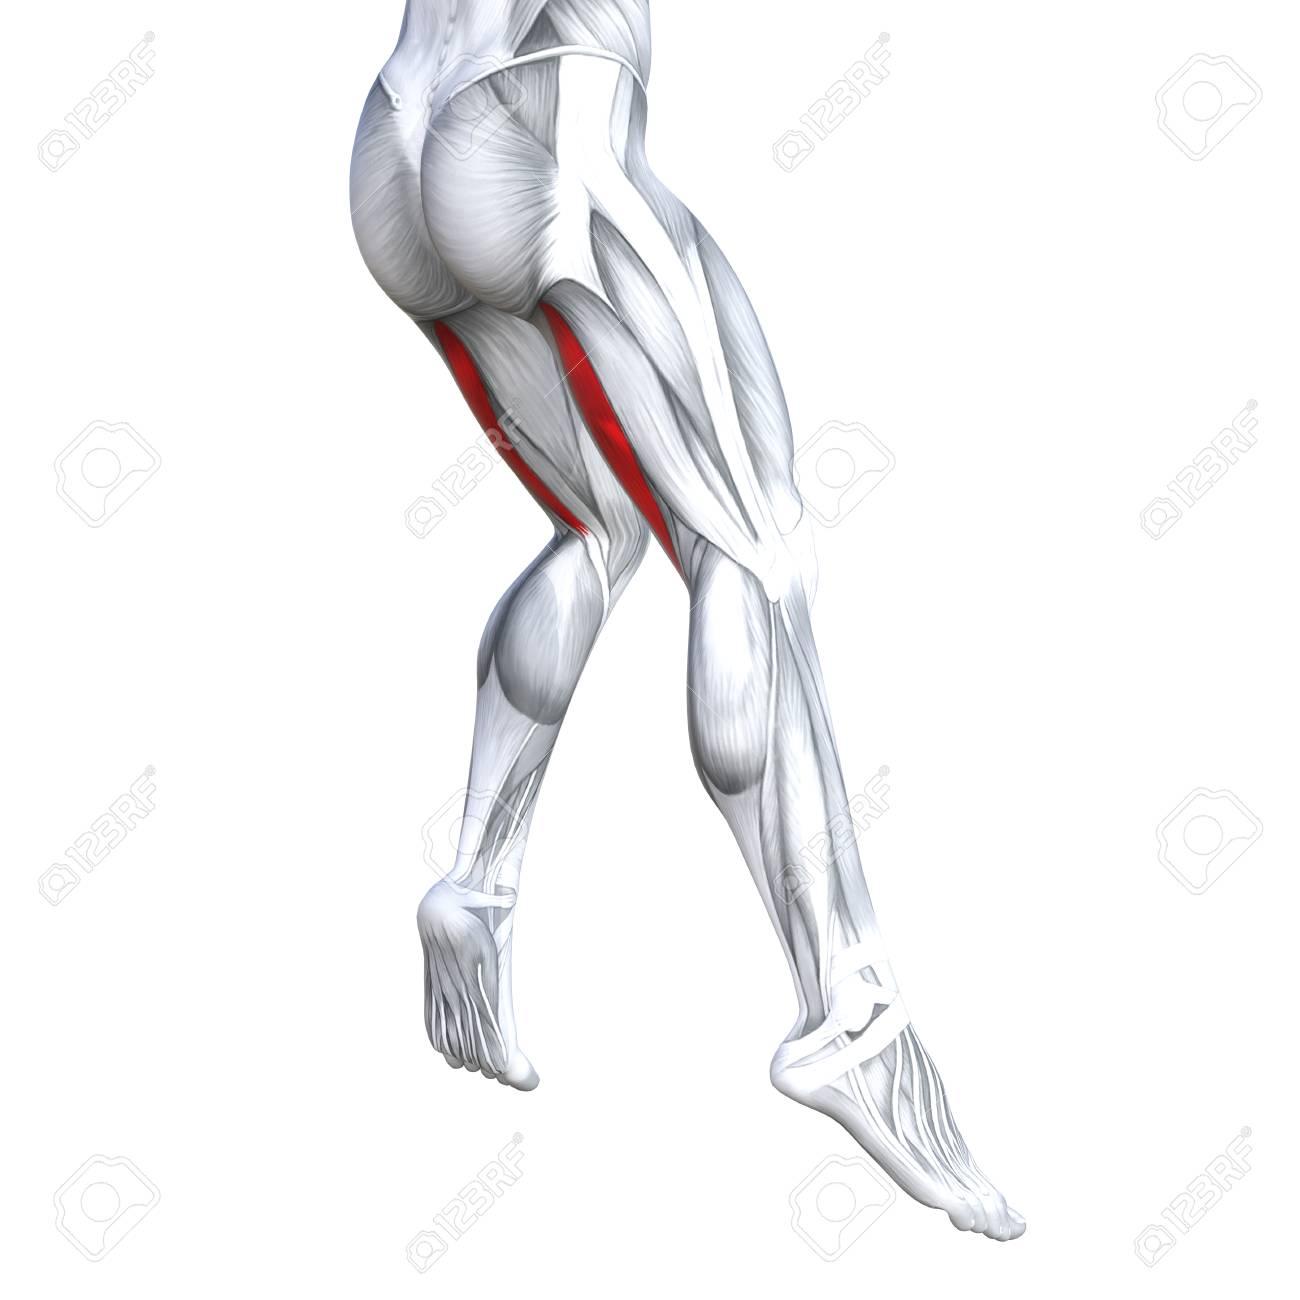 Concept Conceptual 3d Illustration Fit Strong Back Upper Leg Stock